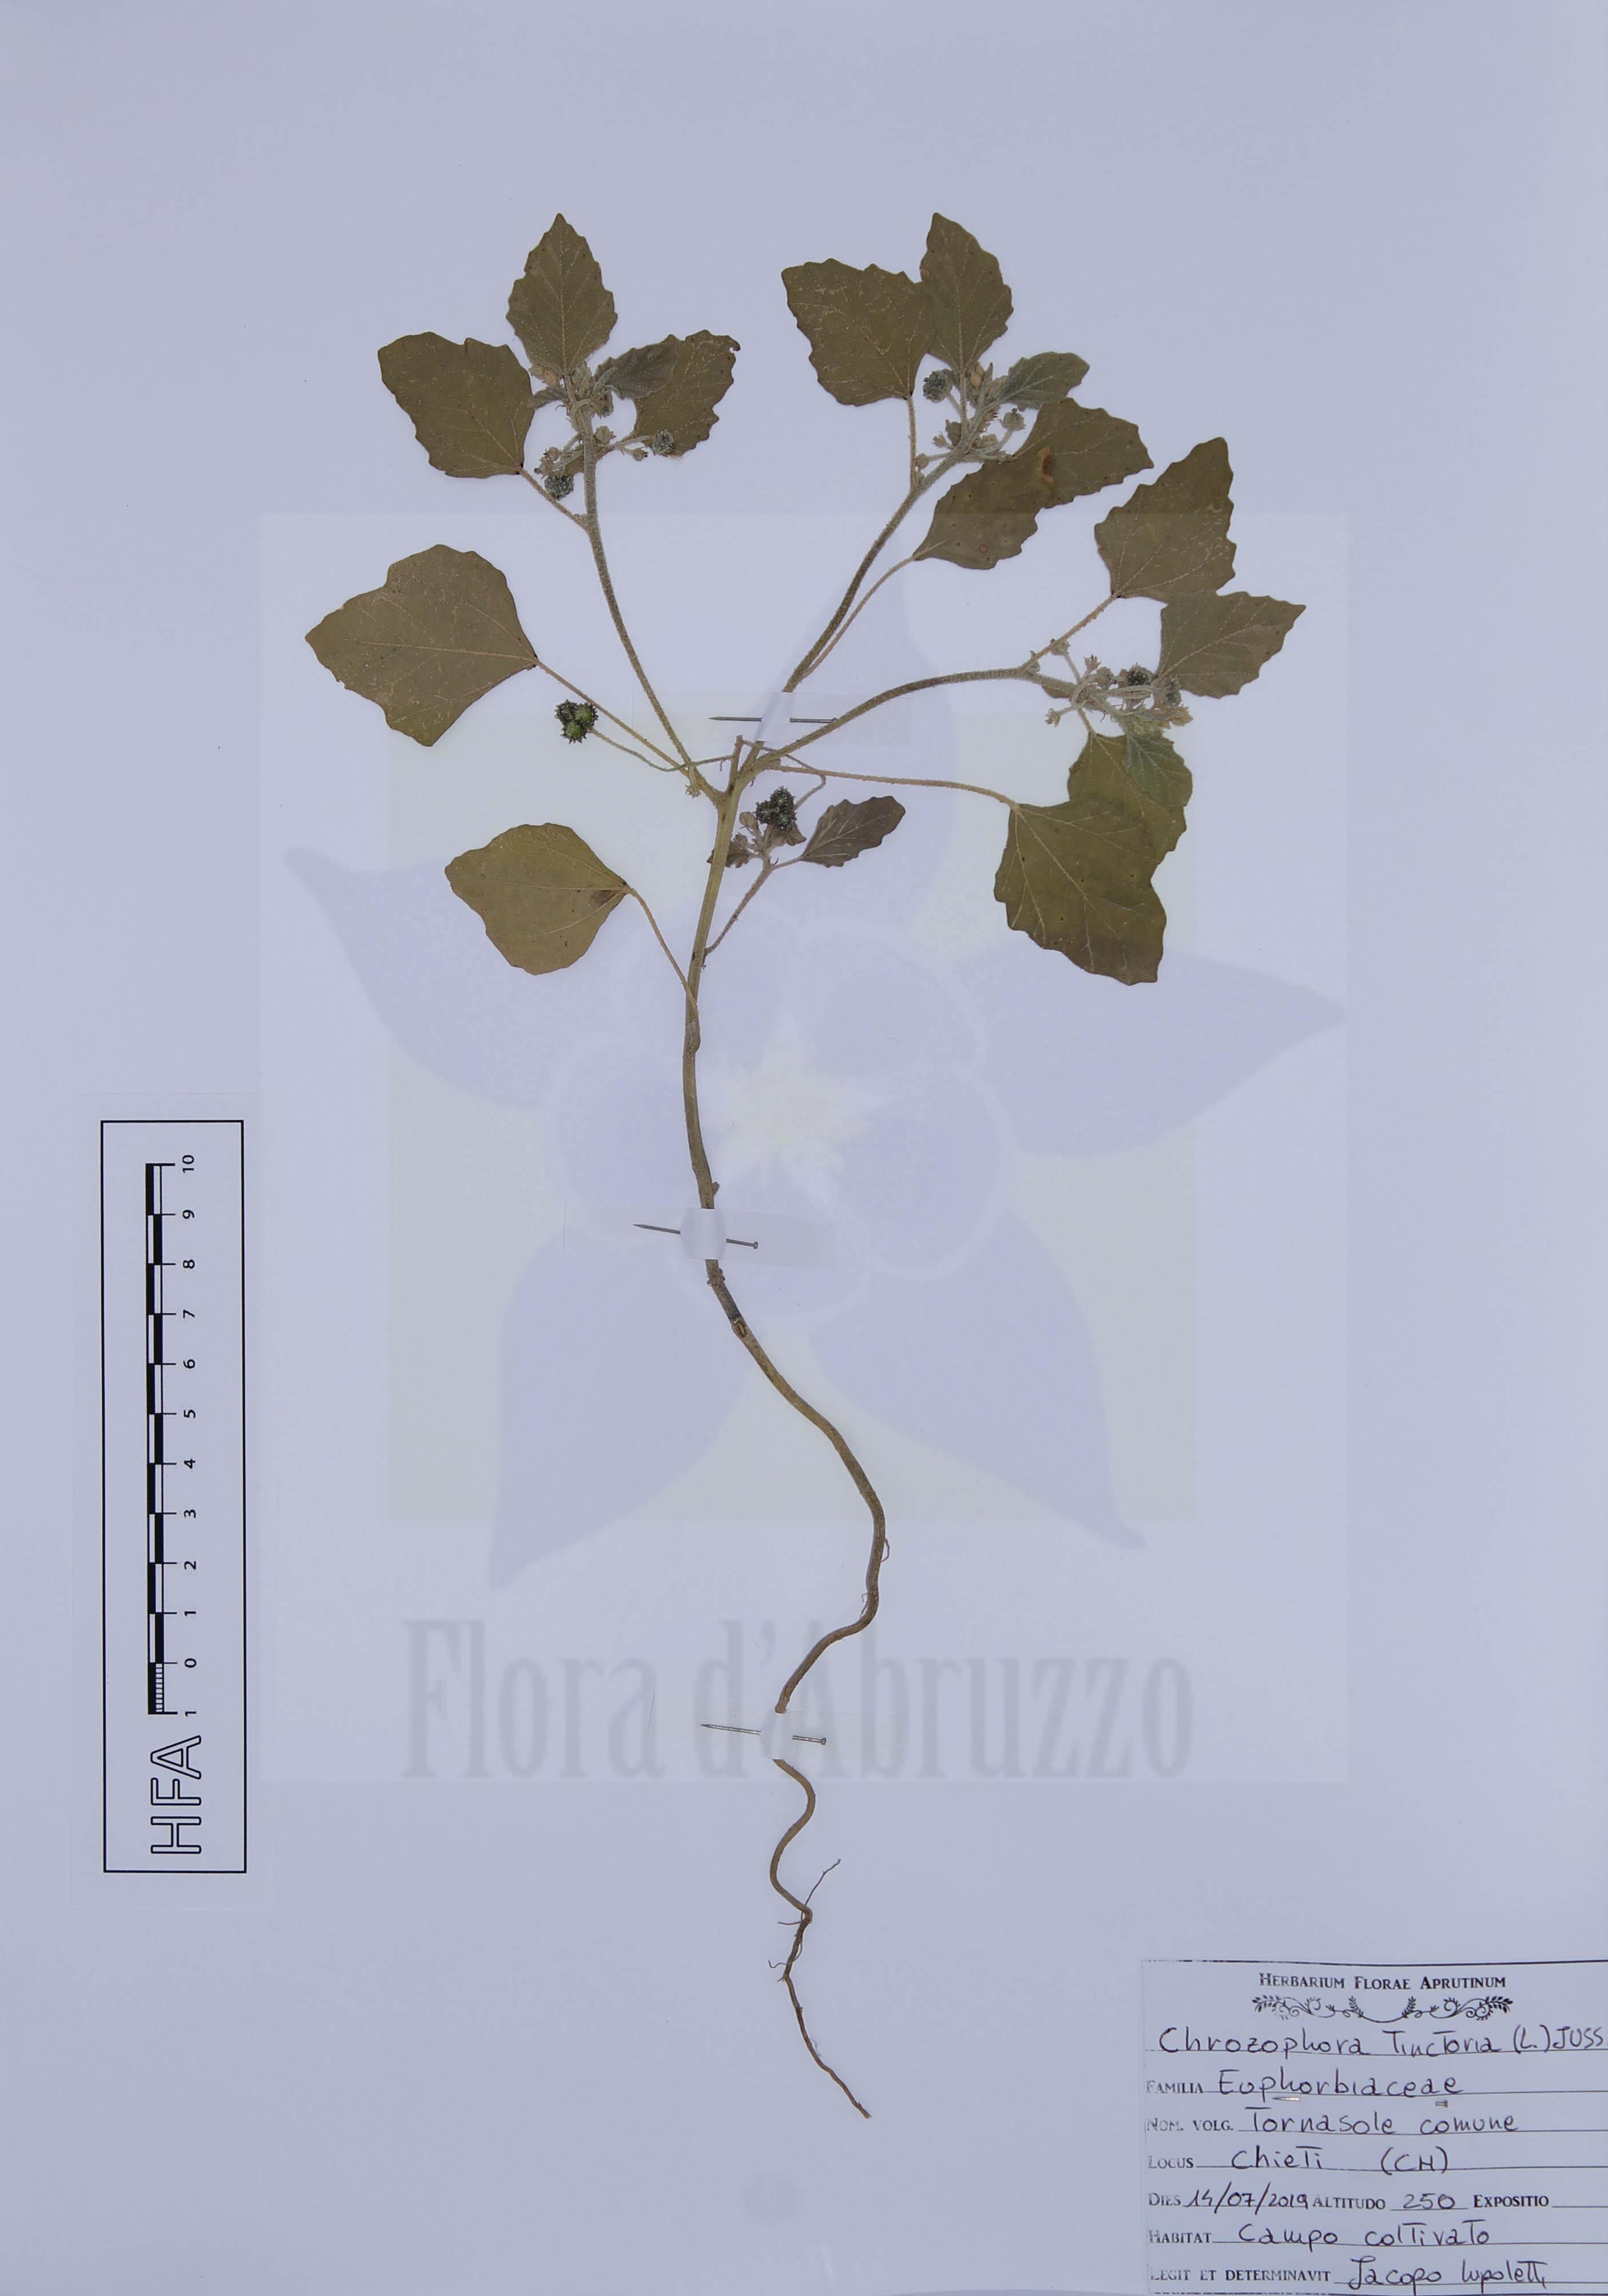 Chrozophora tinctoria (L.) A. Juss.